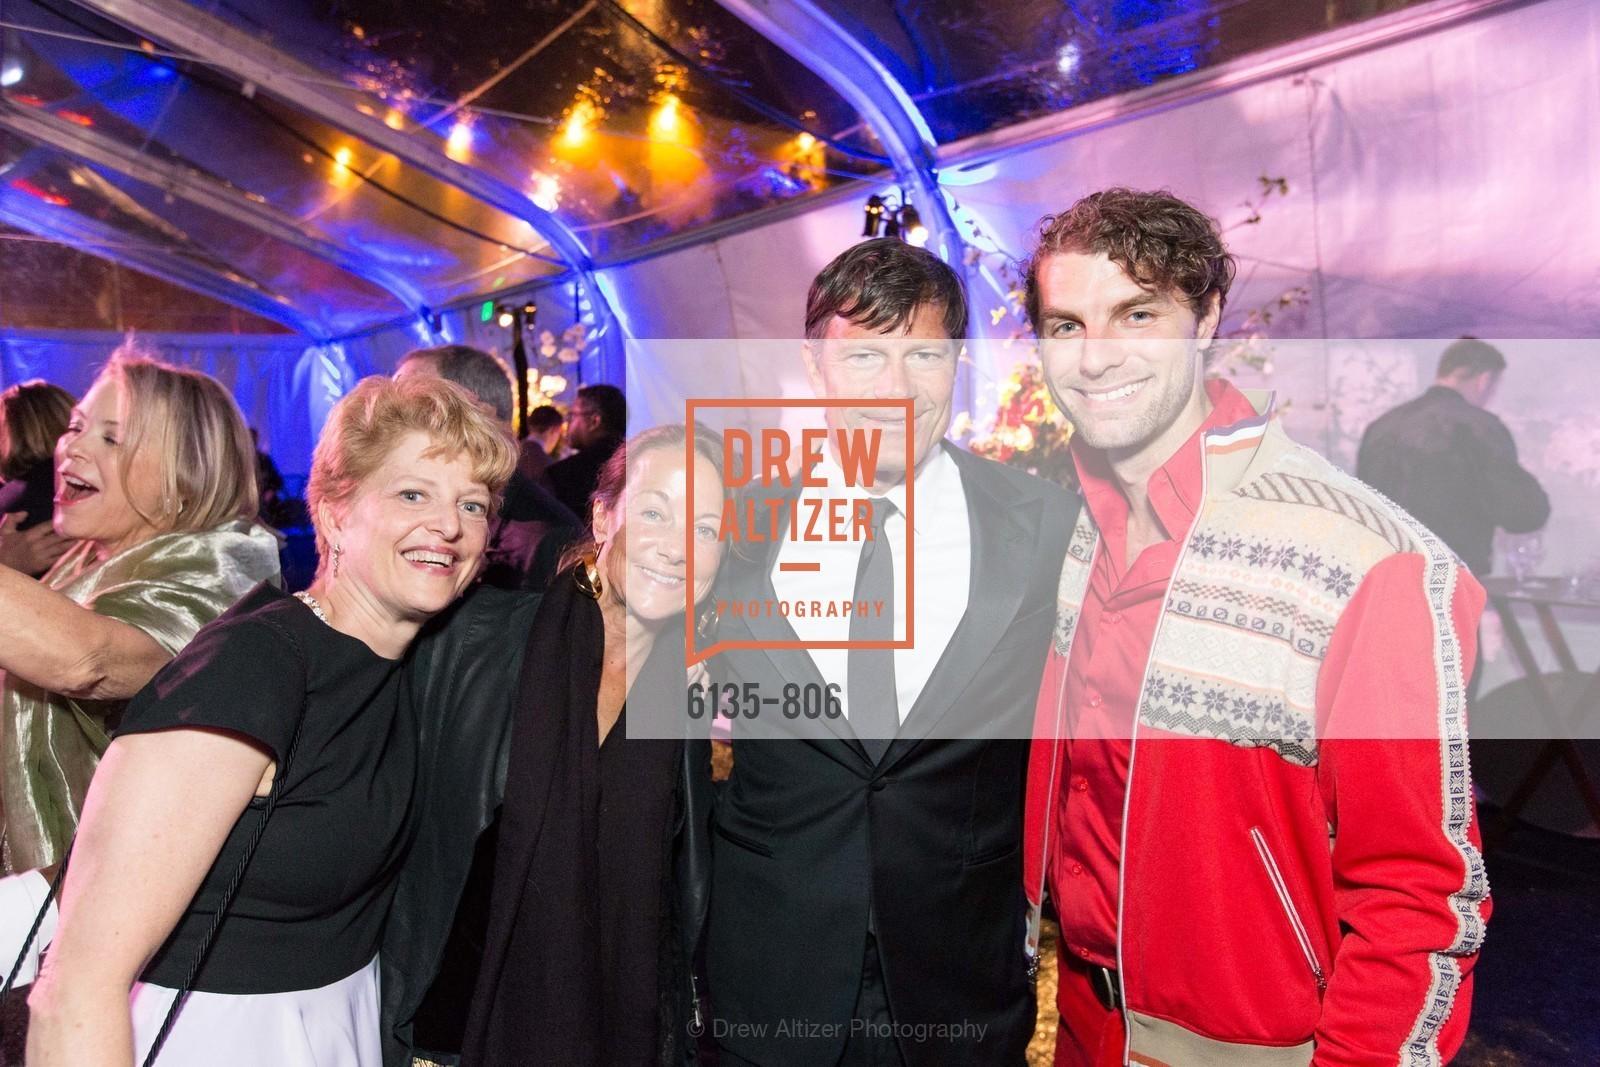 Carey Perloff, Laura Ubben, Jeff Ubben, Photo #6135-806